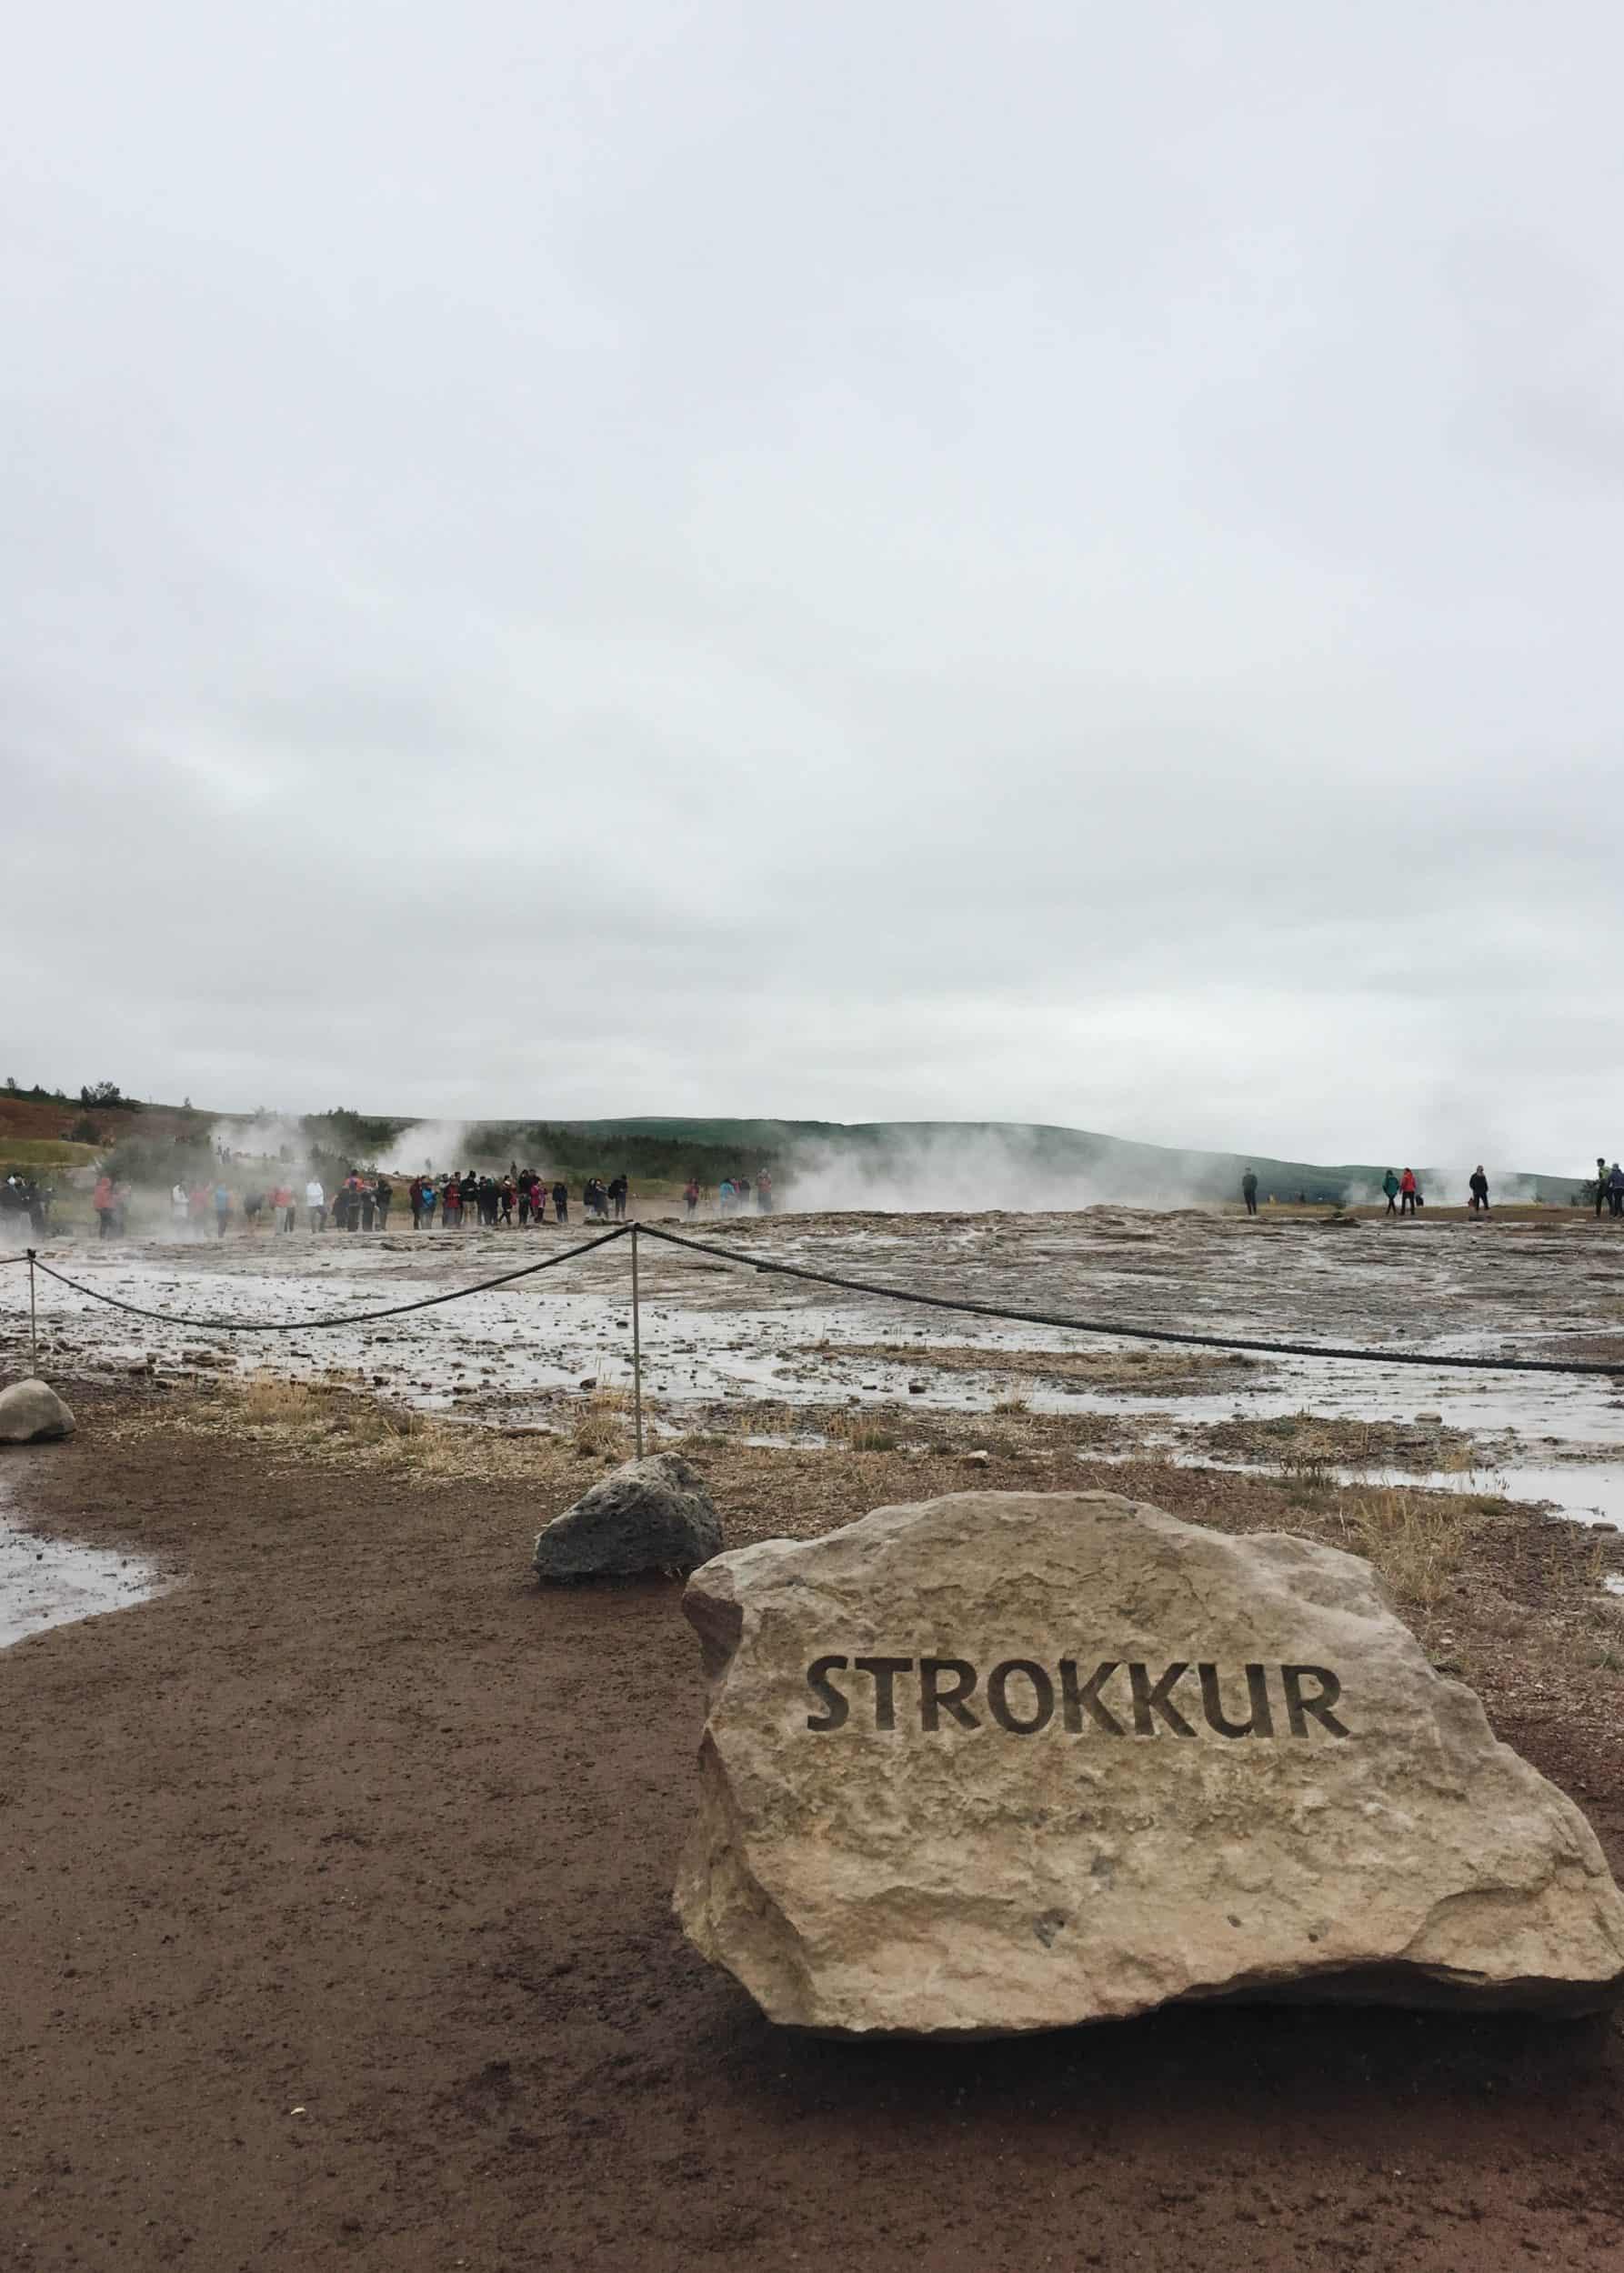 Strokkur Geysir Pool | Diary of a Toronto Girl, a Canadian lifestyle blog